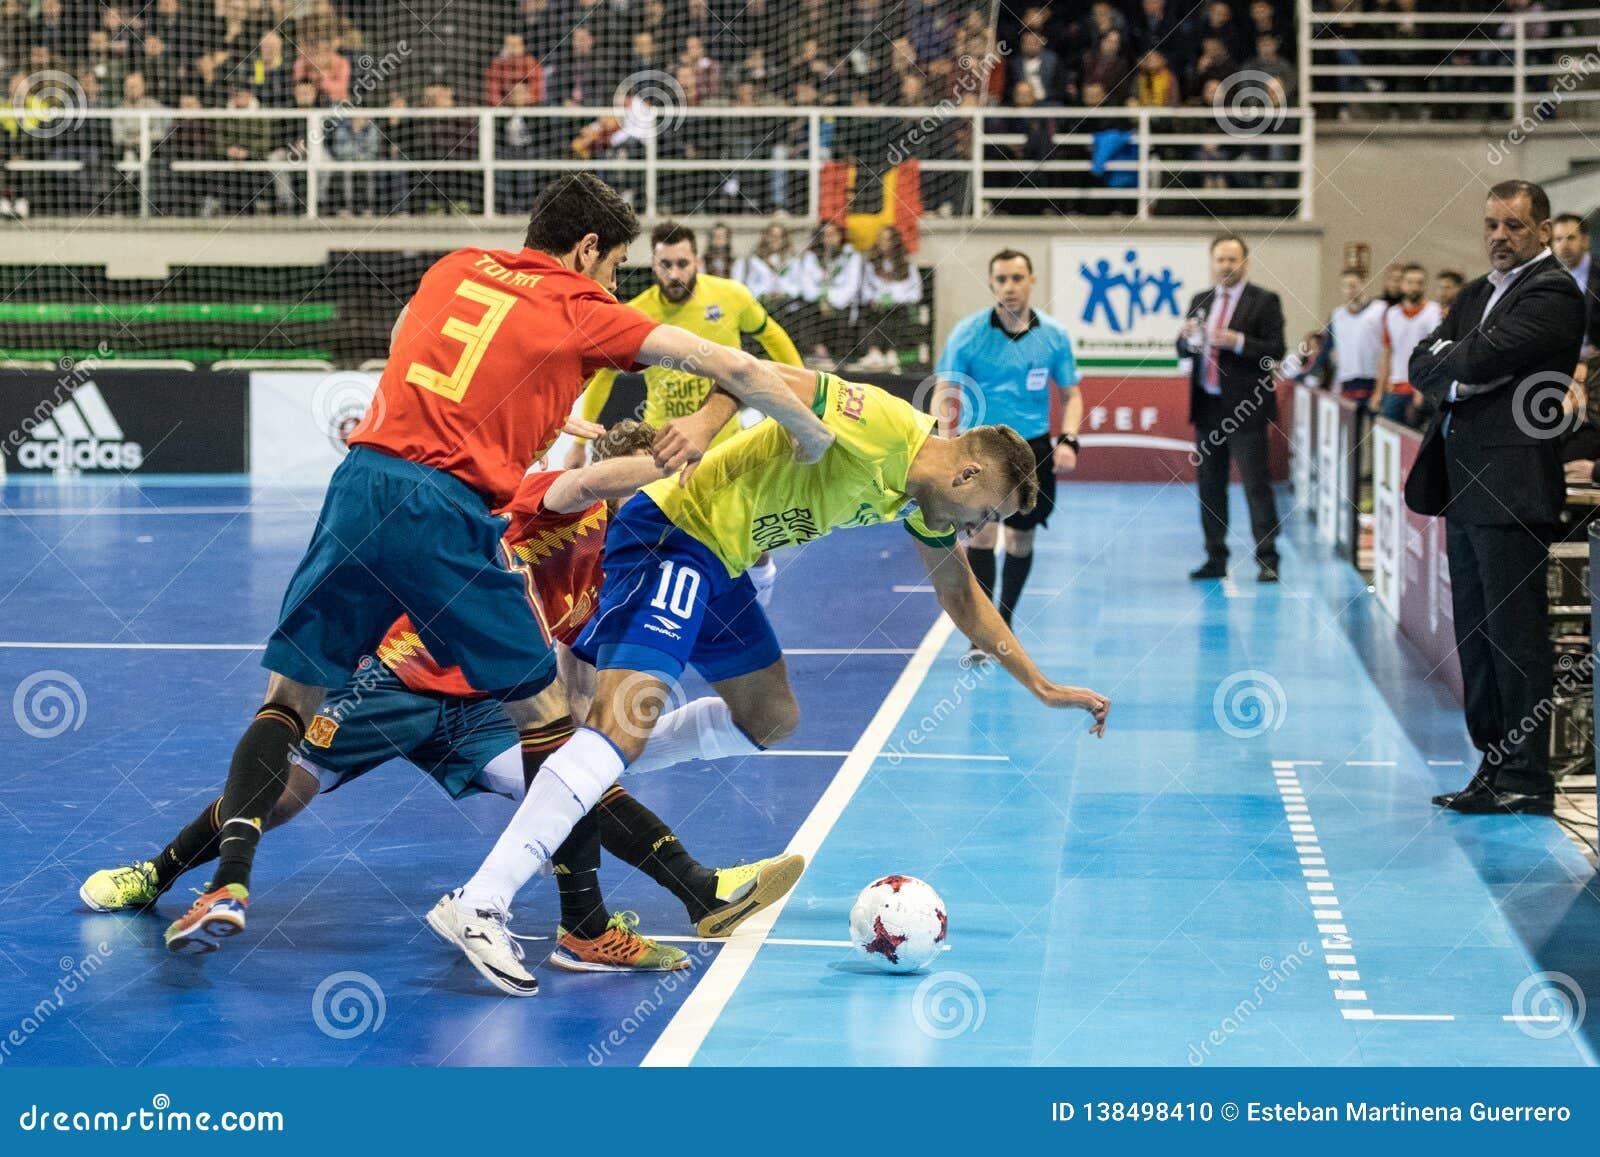 Fósforo footsal interno das equipes nacionais de Espanha e de Brasil no pavilhão de Multiusos de Caceres